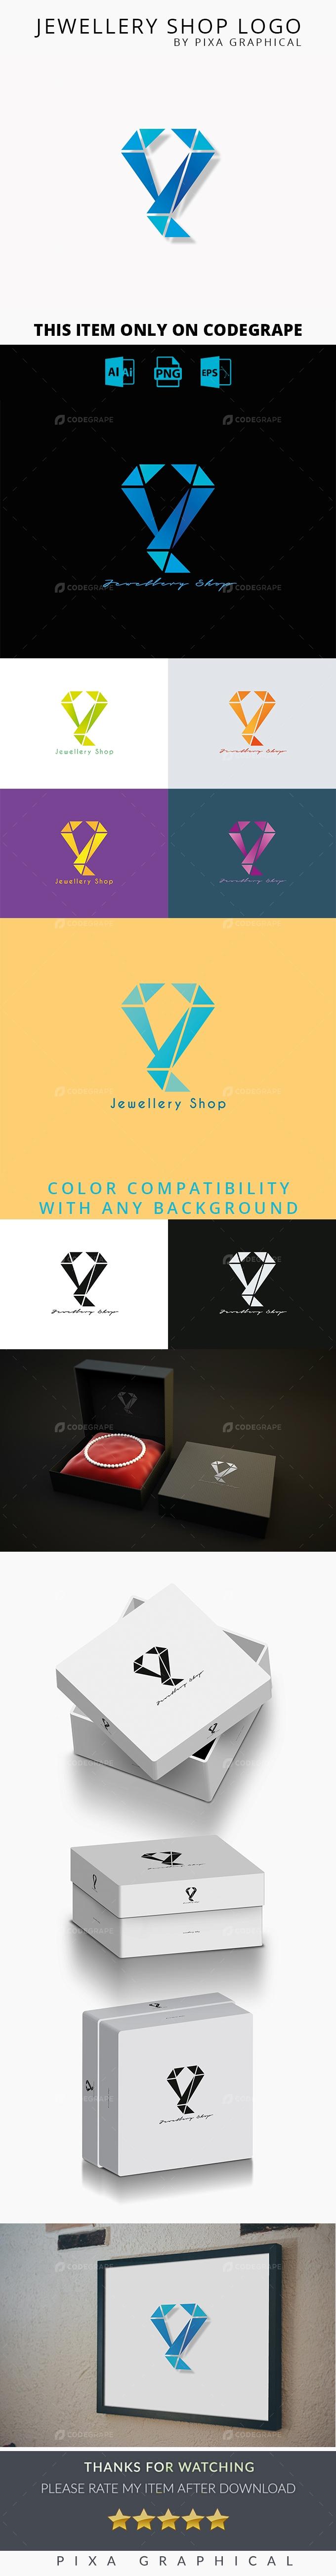 Jewellery Shop Logo Template